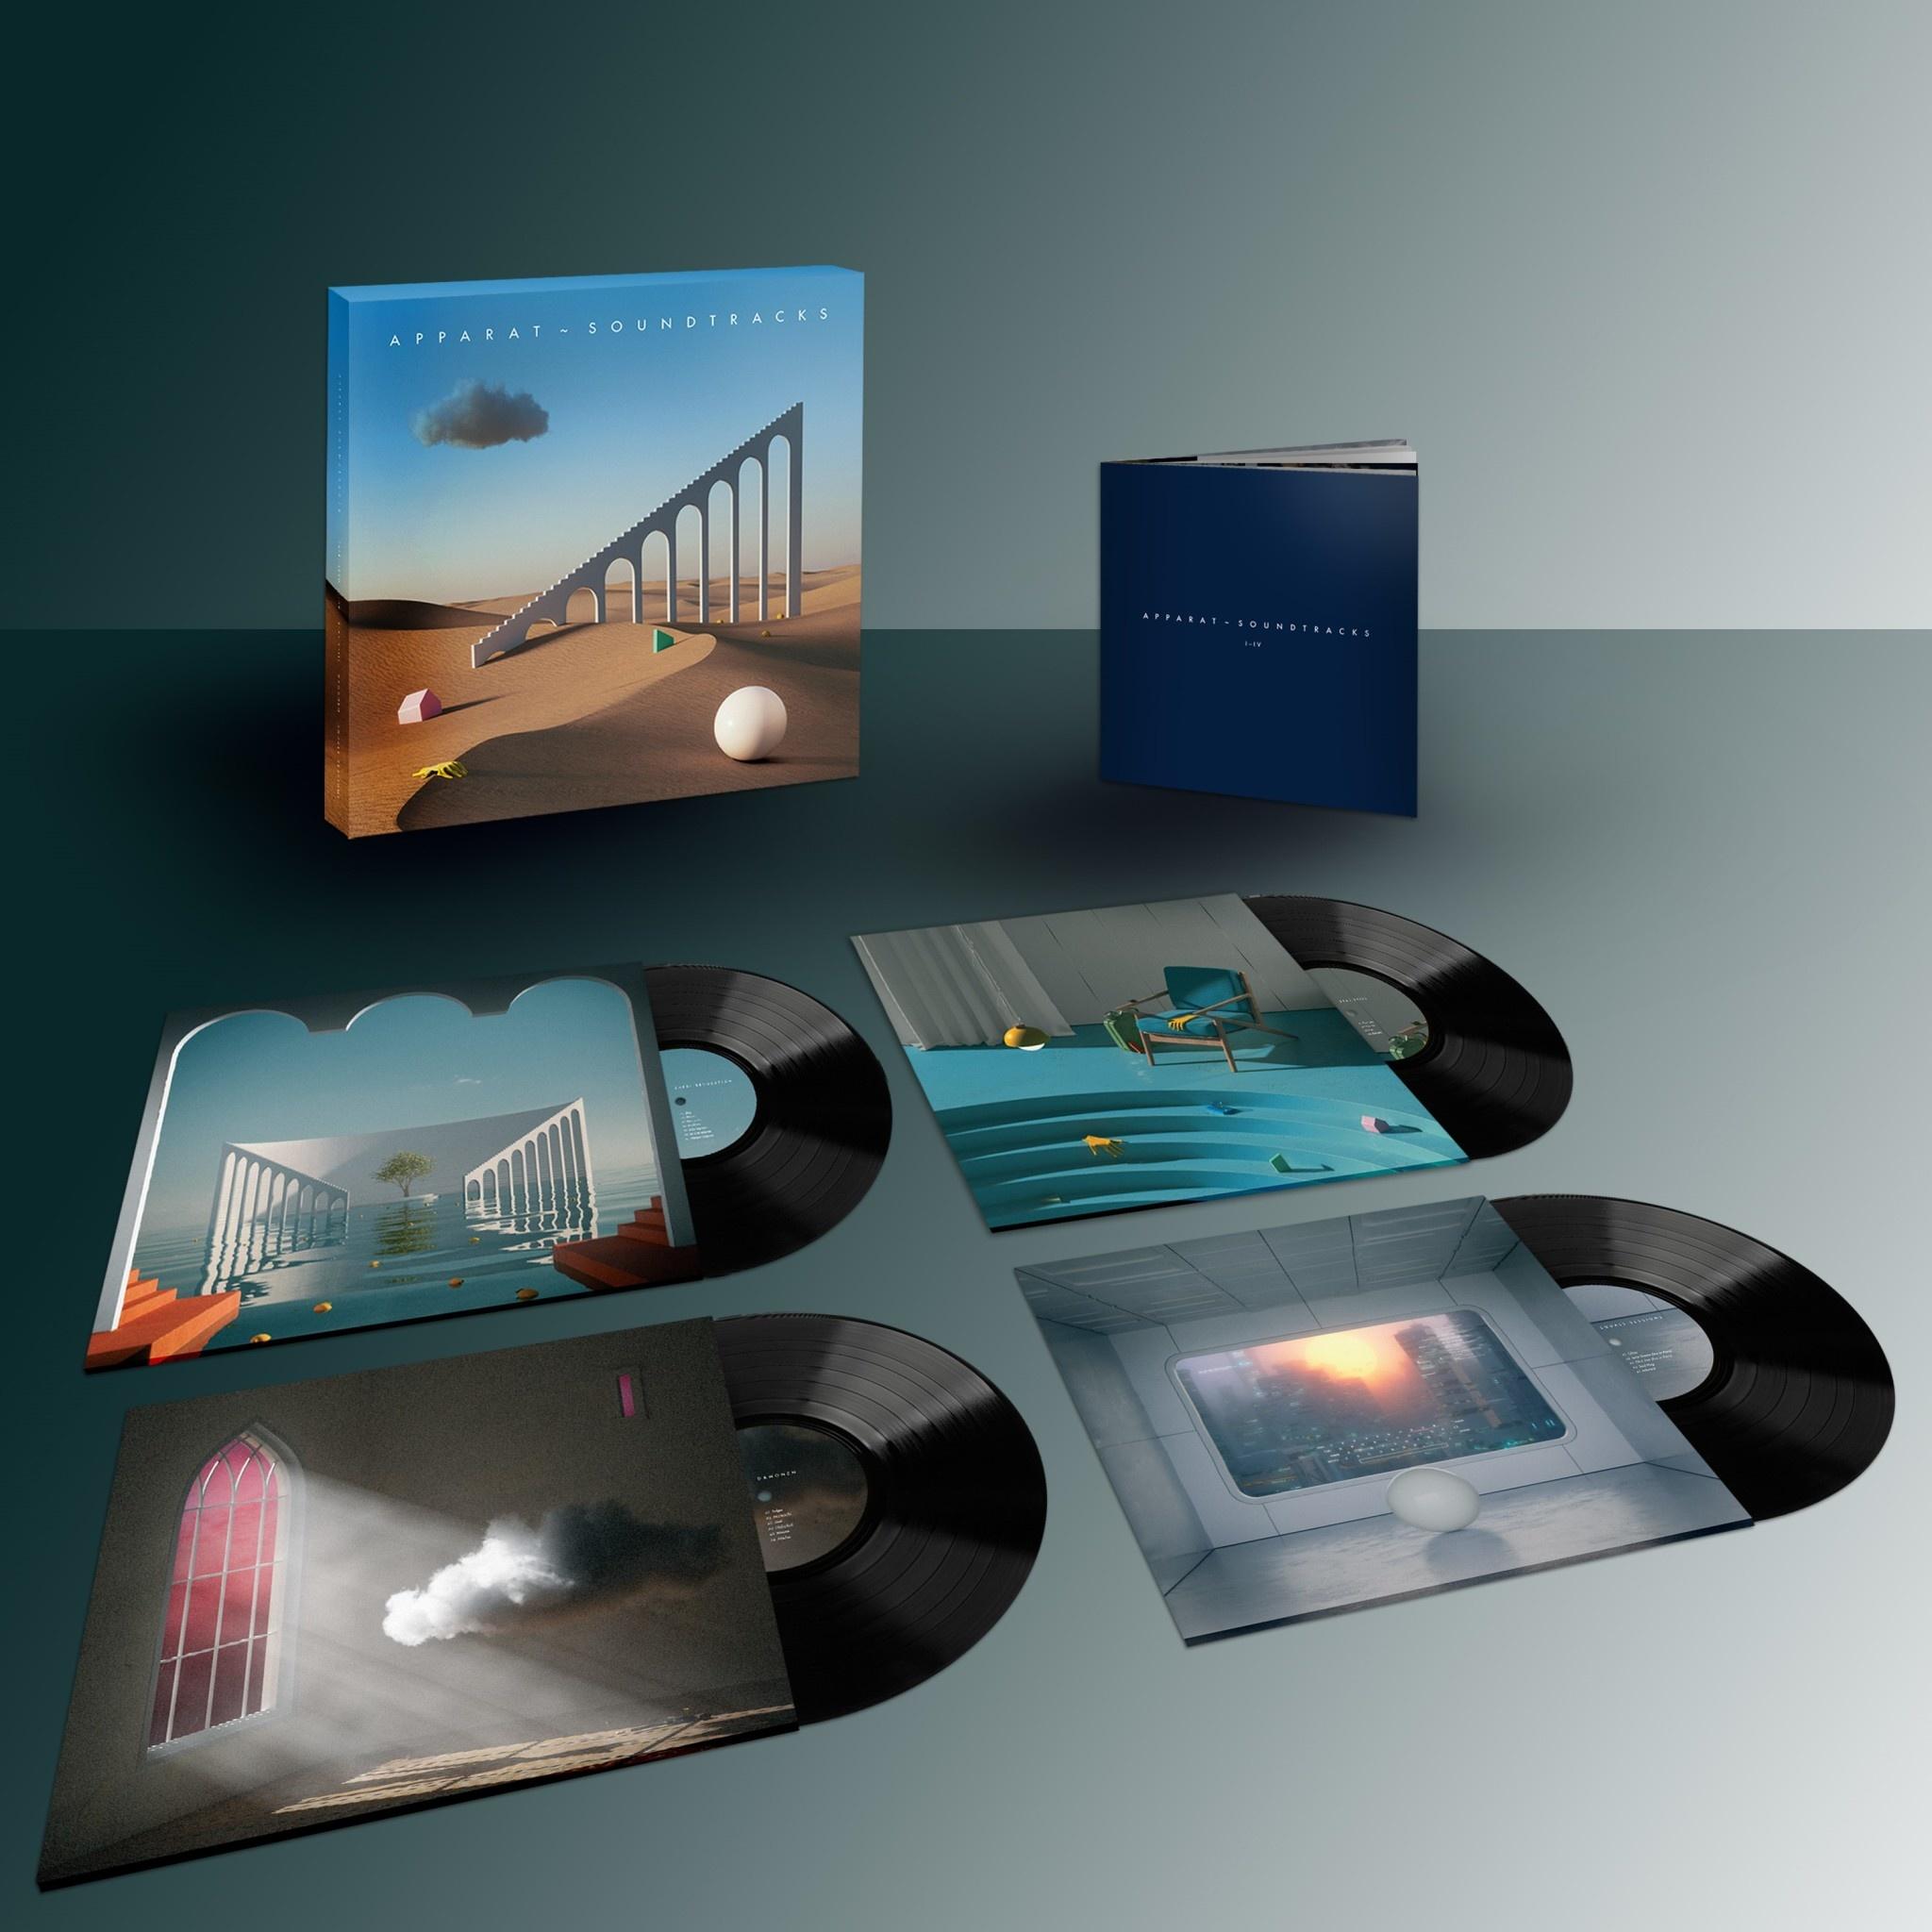 Mute Records Apparat - Soundtracks